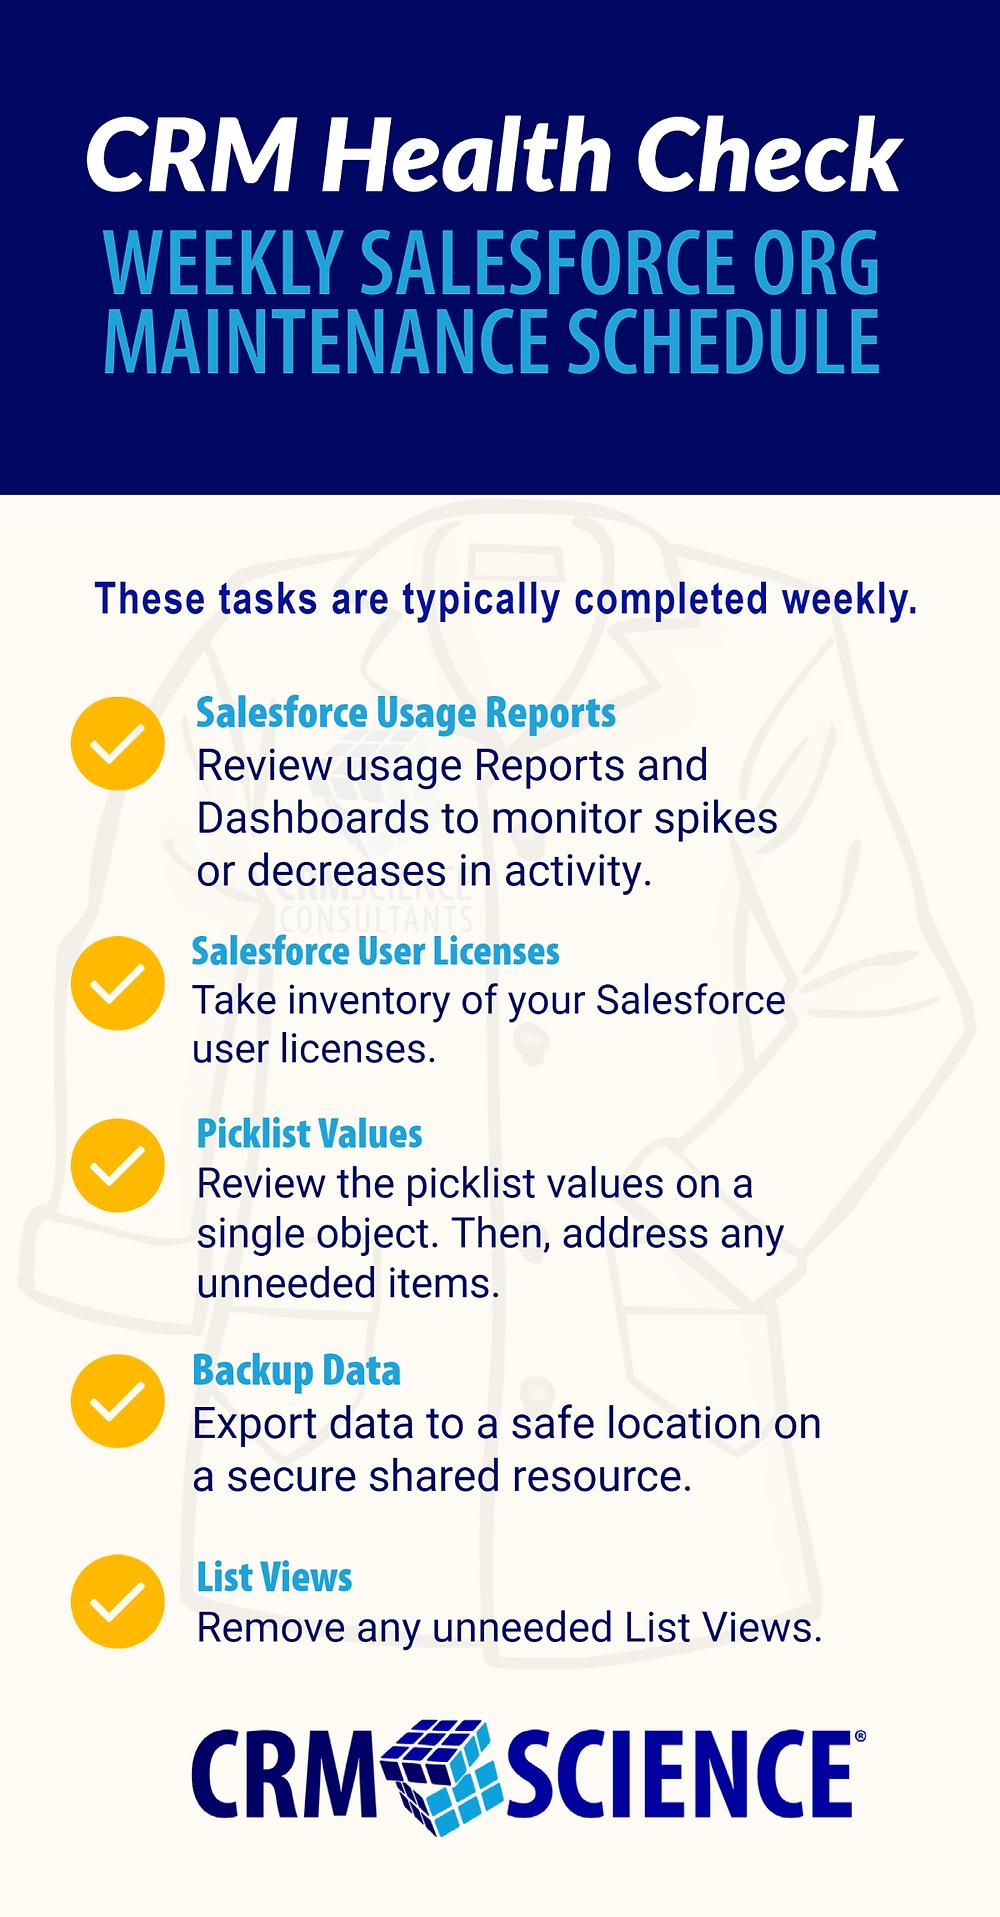 CRM Health Check: Weekly Salesforce Org Maintenance Schedule